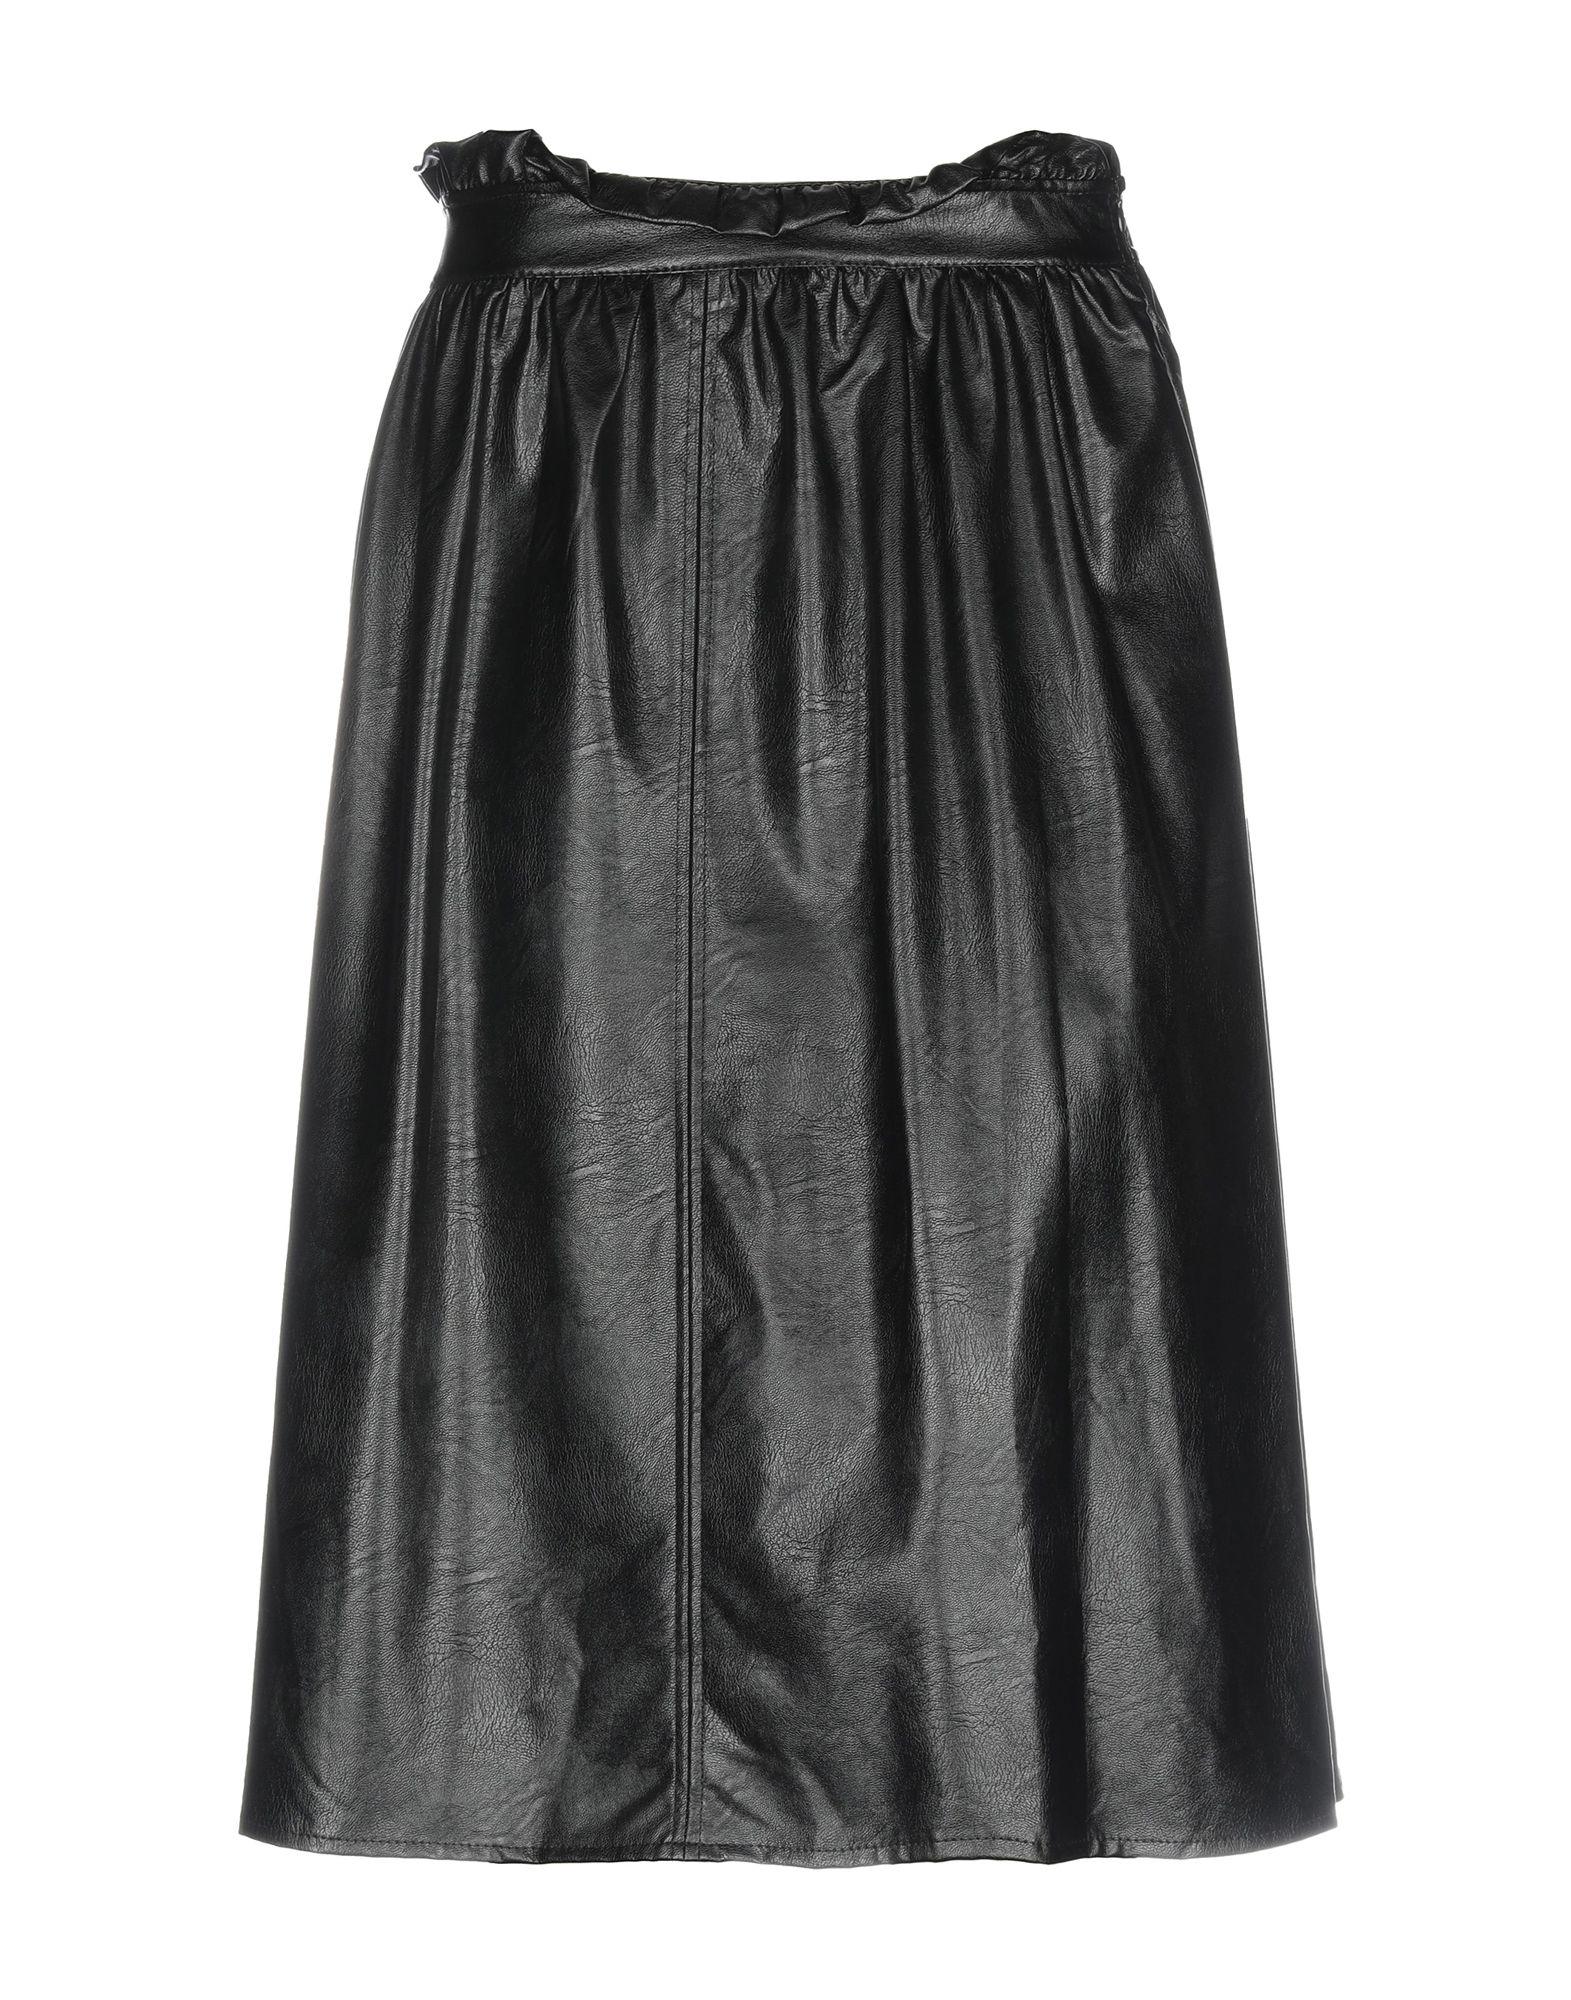 MISS MISS by VALENTINA Юбка длиной 3/4 miss borsalino мини юбка